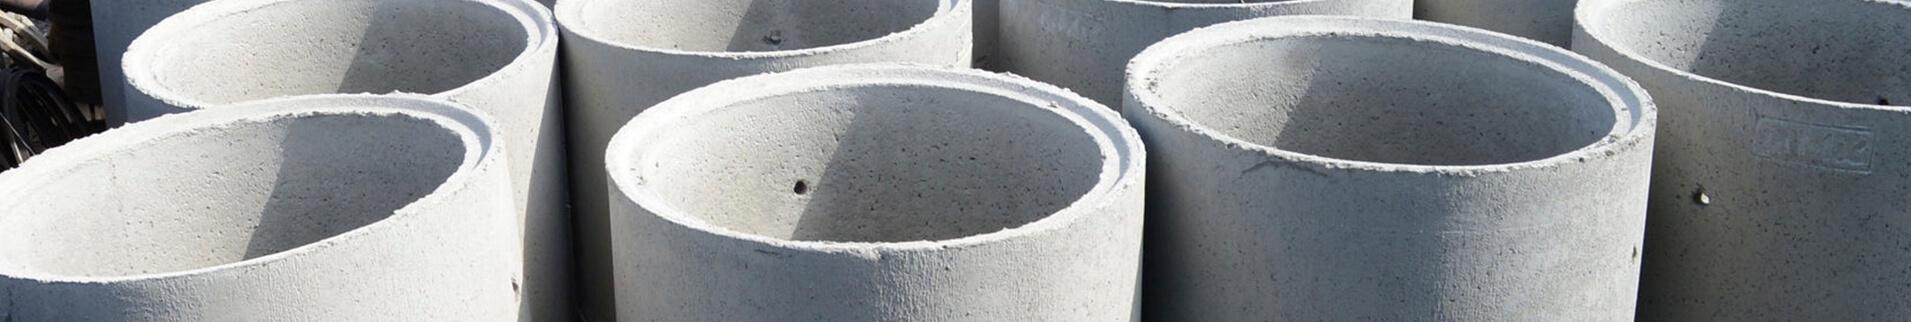 Железобетонные кольца, крышки и днища